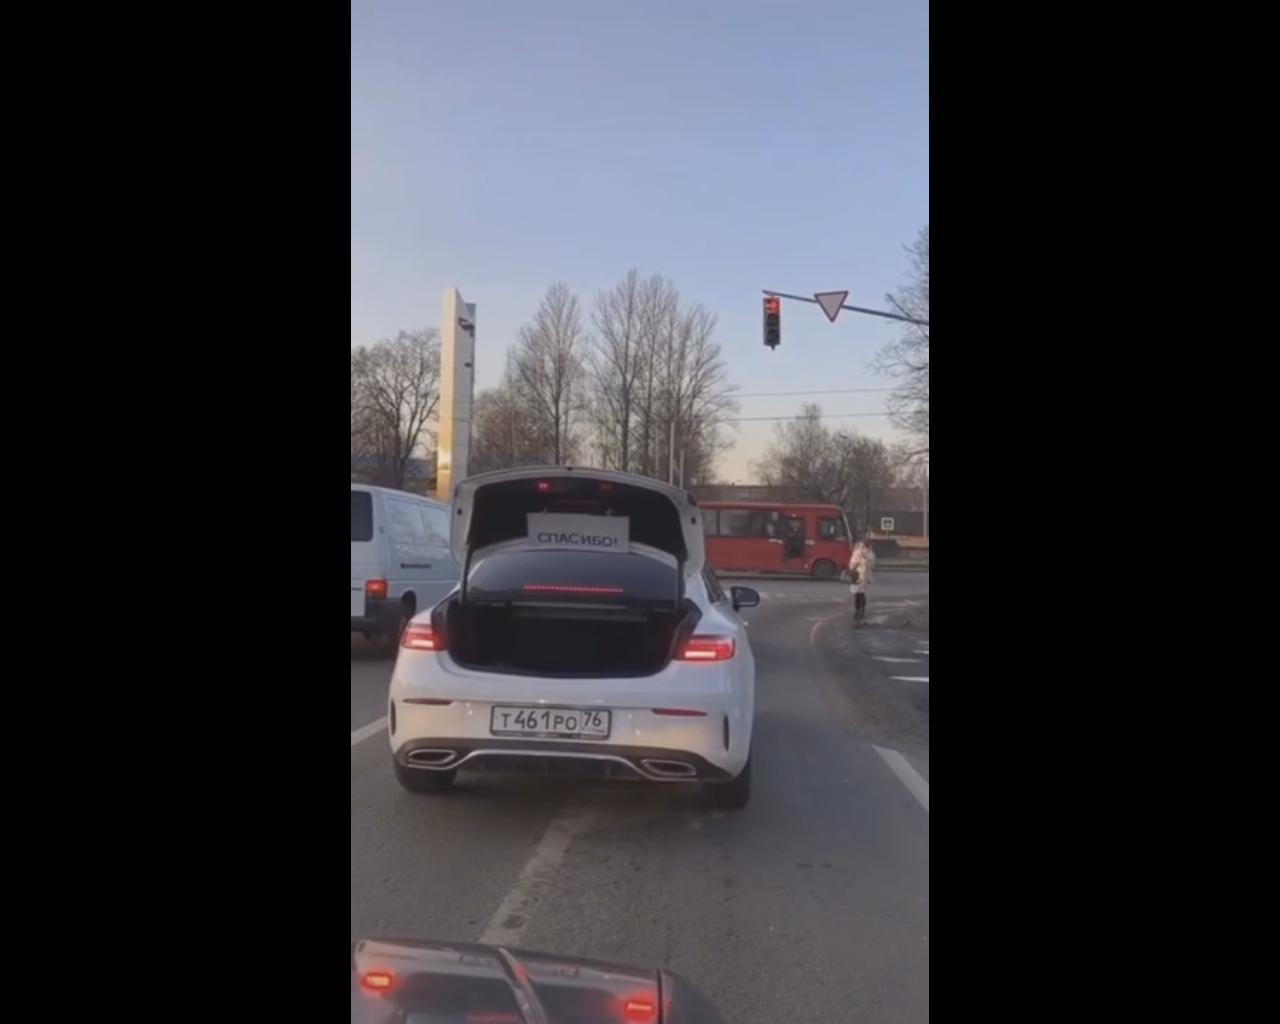 «Аварийка уже не в моде»: ярославец сказал спасибо на дороге по-новому